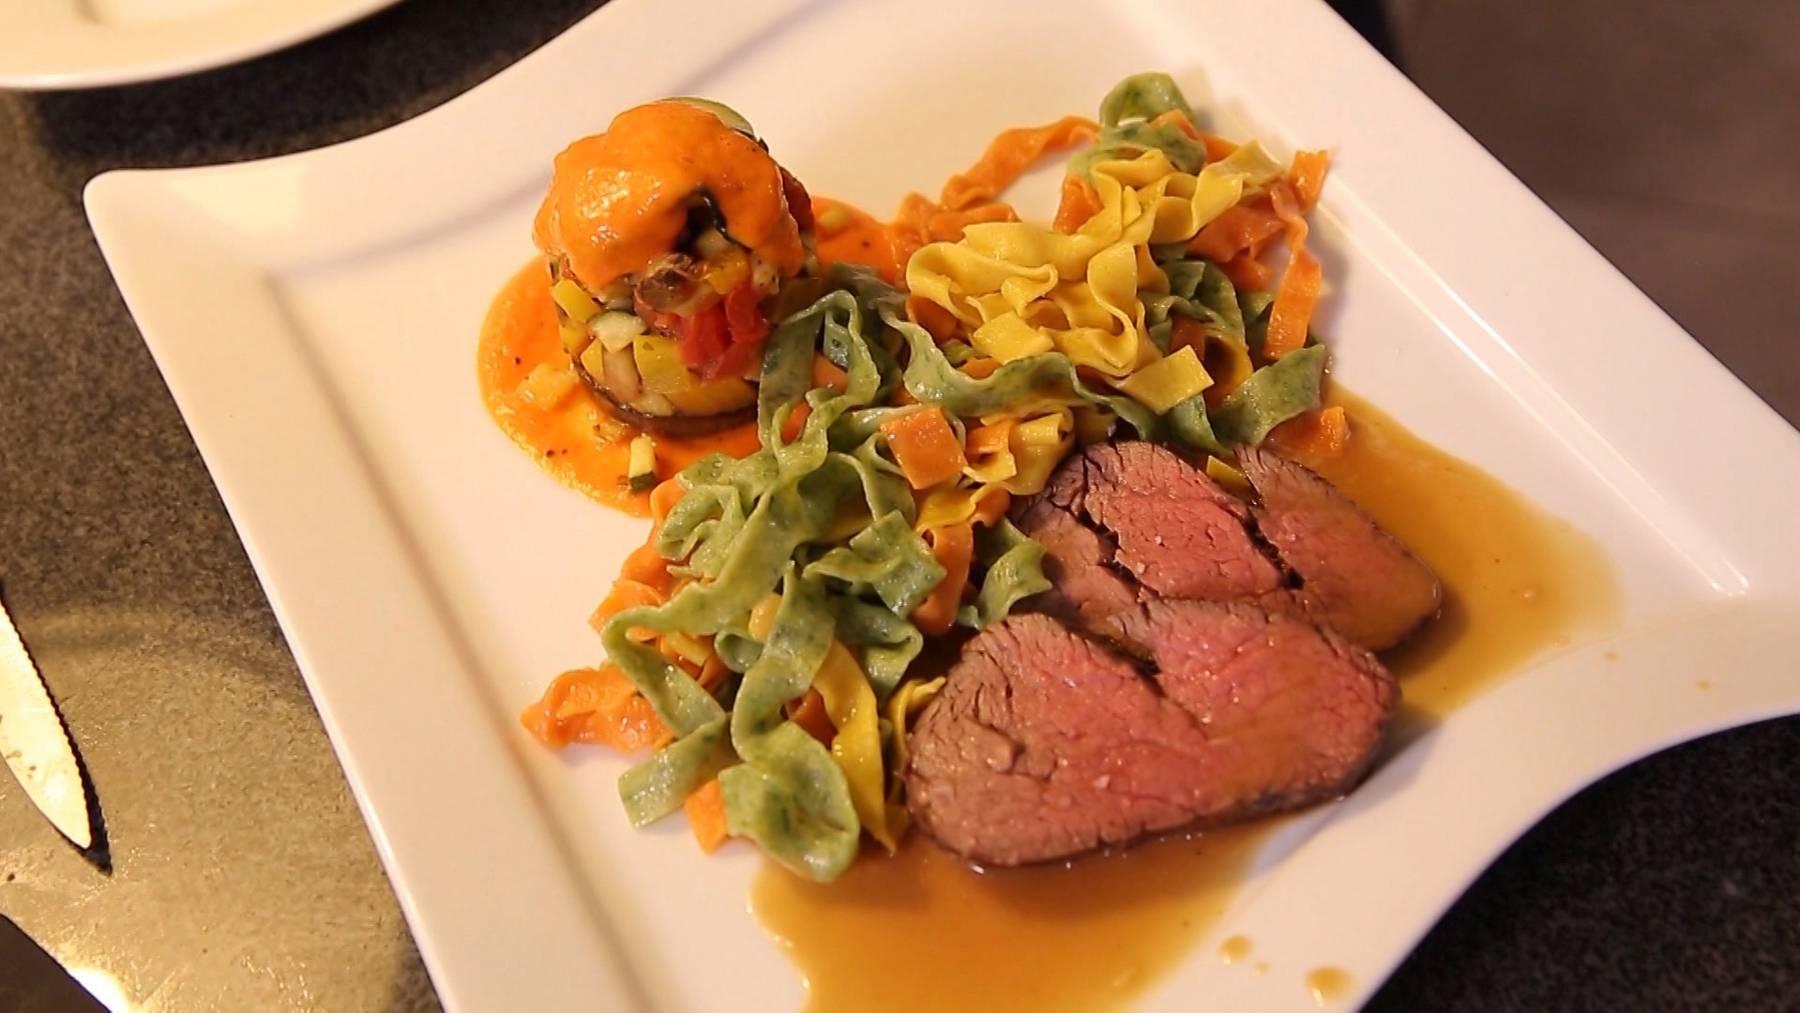 Rinderfilet an Portweinsauce Hausgemachte Tagliatelle Ratatouille